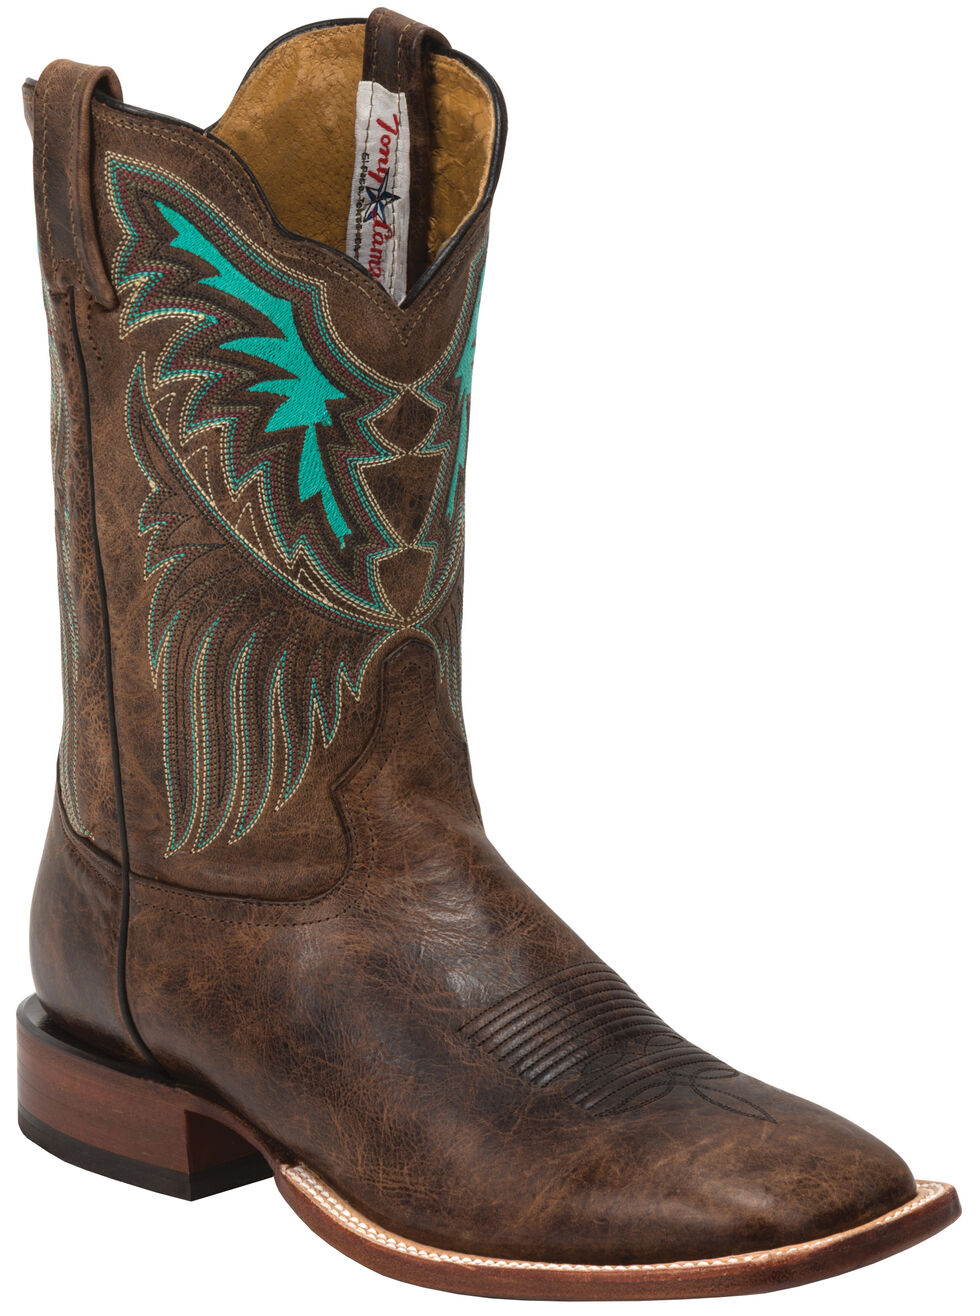 Tony Lama Iron Shiloh San Saba Western Boots - Square Toe , Brown, hi-res